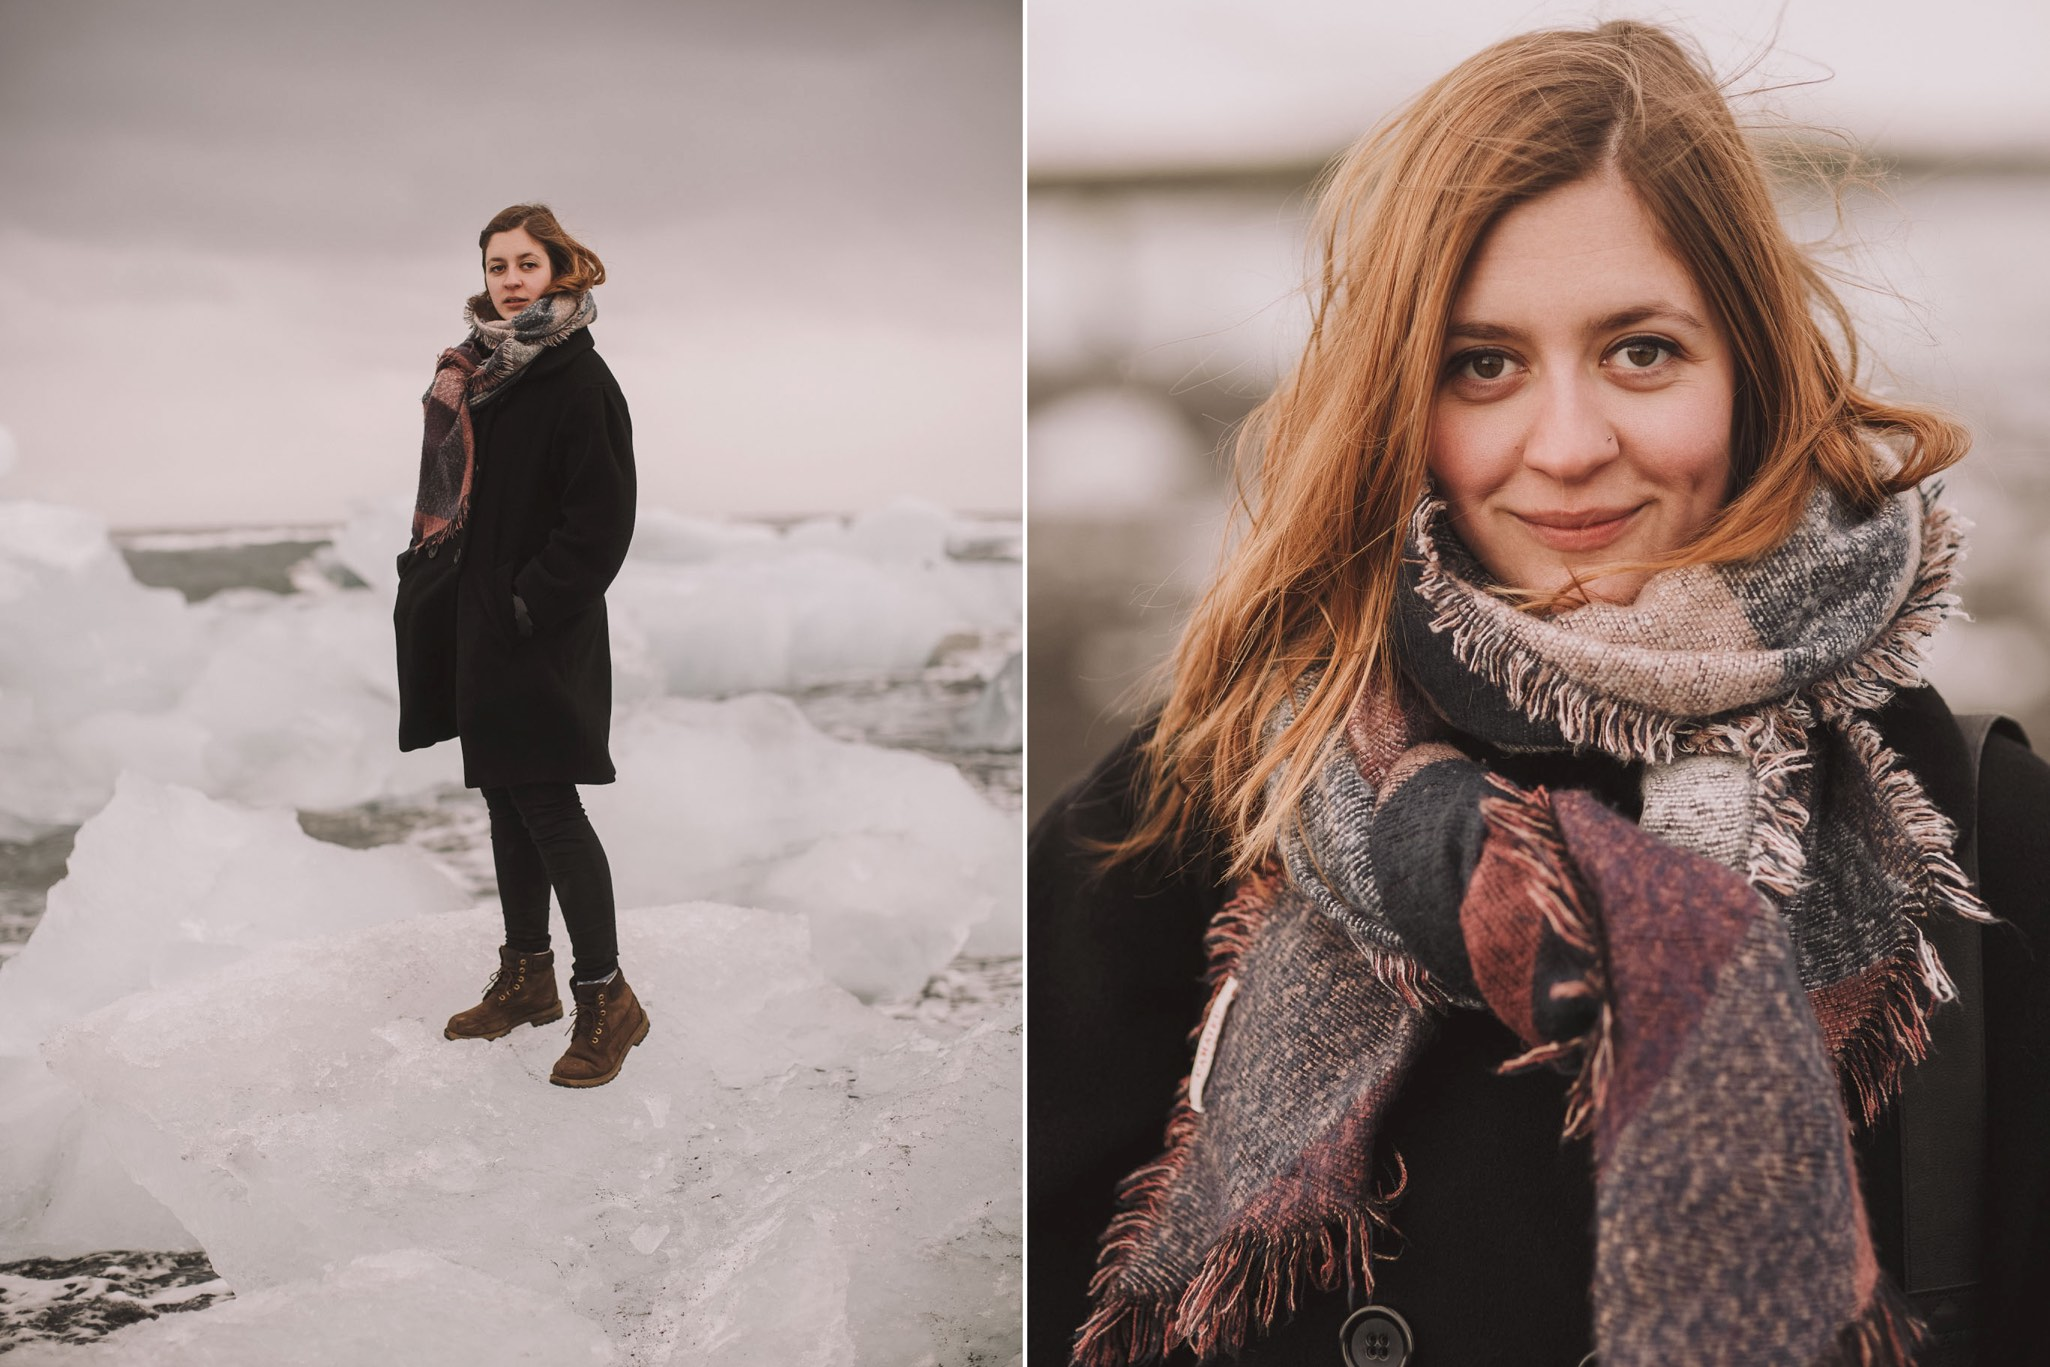 Road-trip-Islande-Iceland-Voyage-Travel-Portrait-Jérémy-Boyer-Jokulsarlon-Ice-Beach-plage-glace-17.jpg